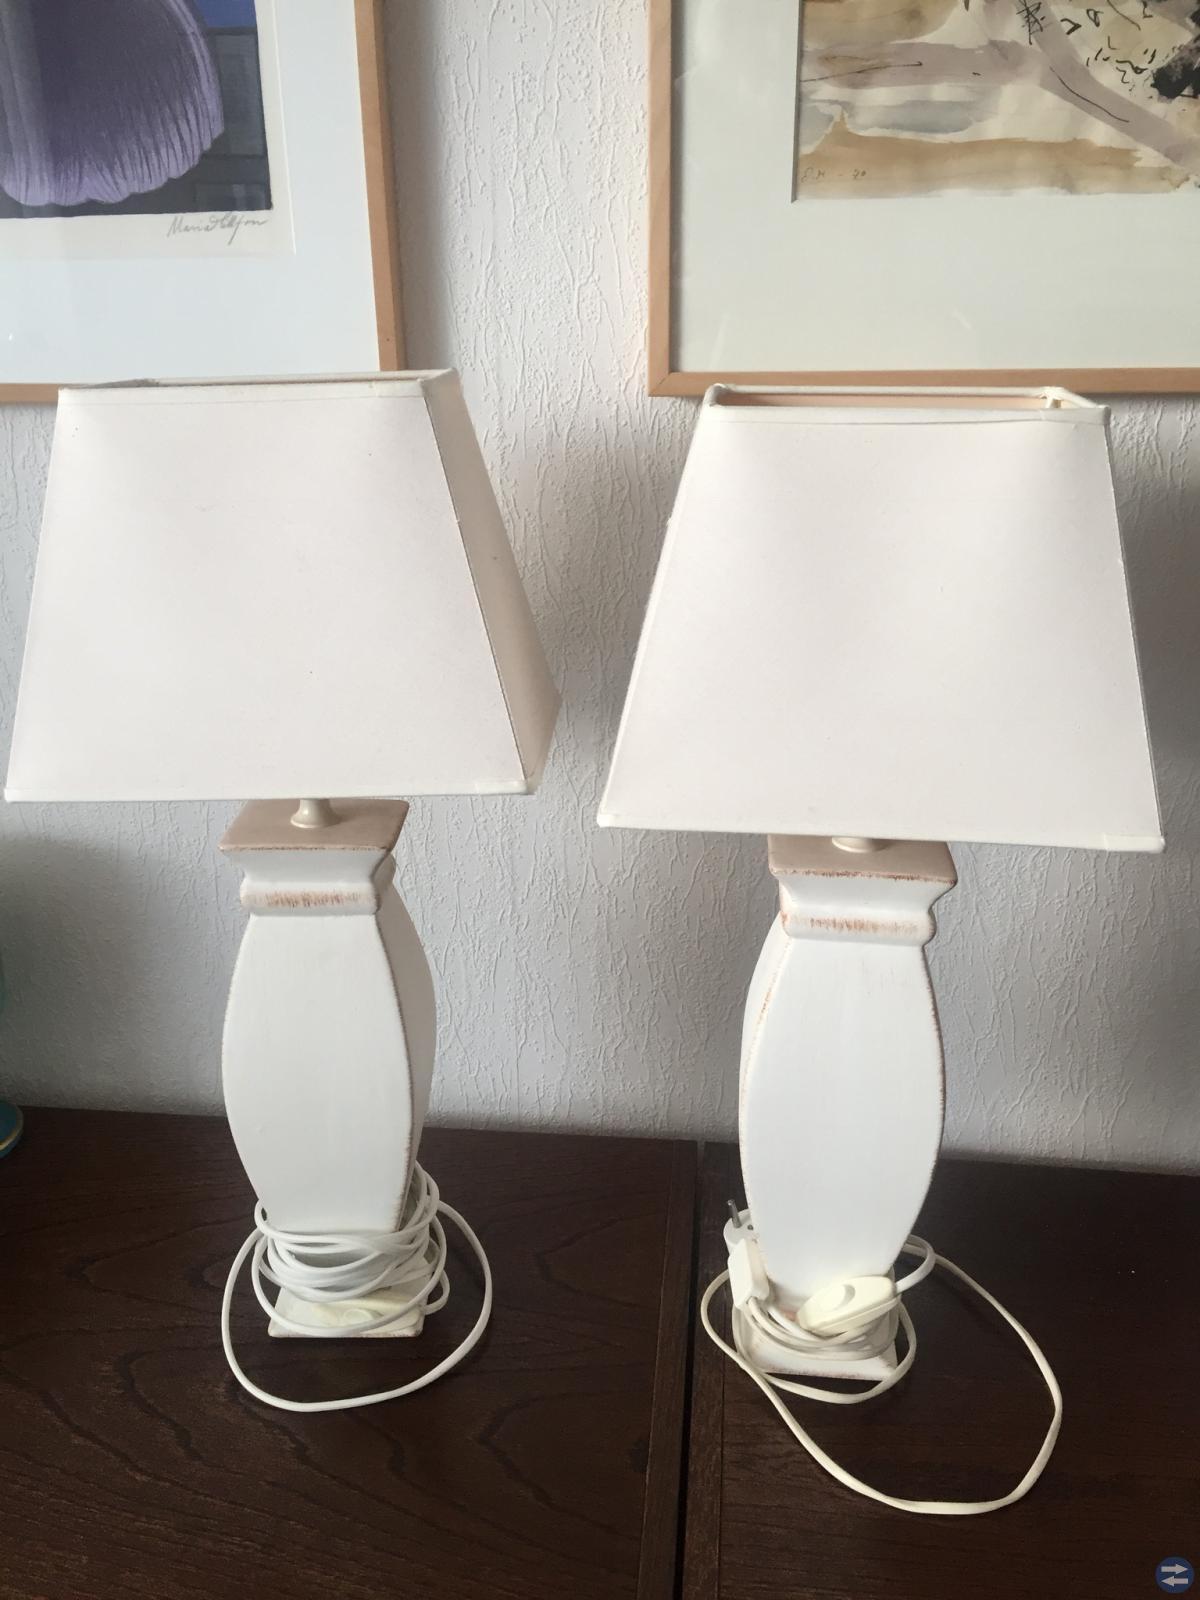 Två beige/ vita bordslampor.